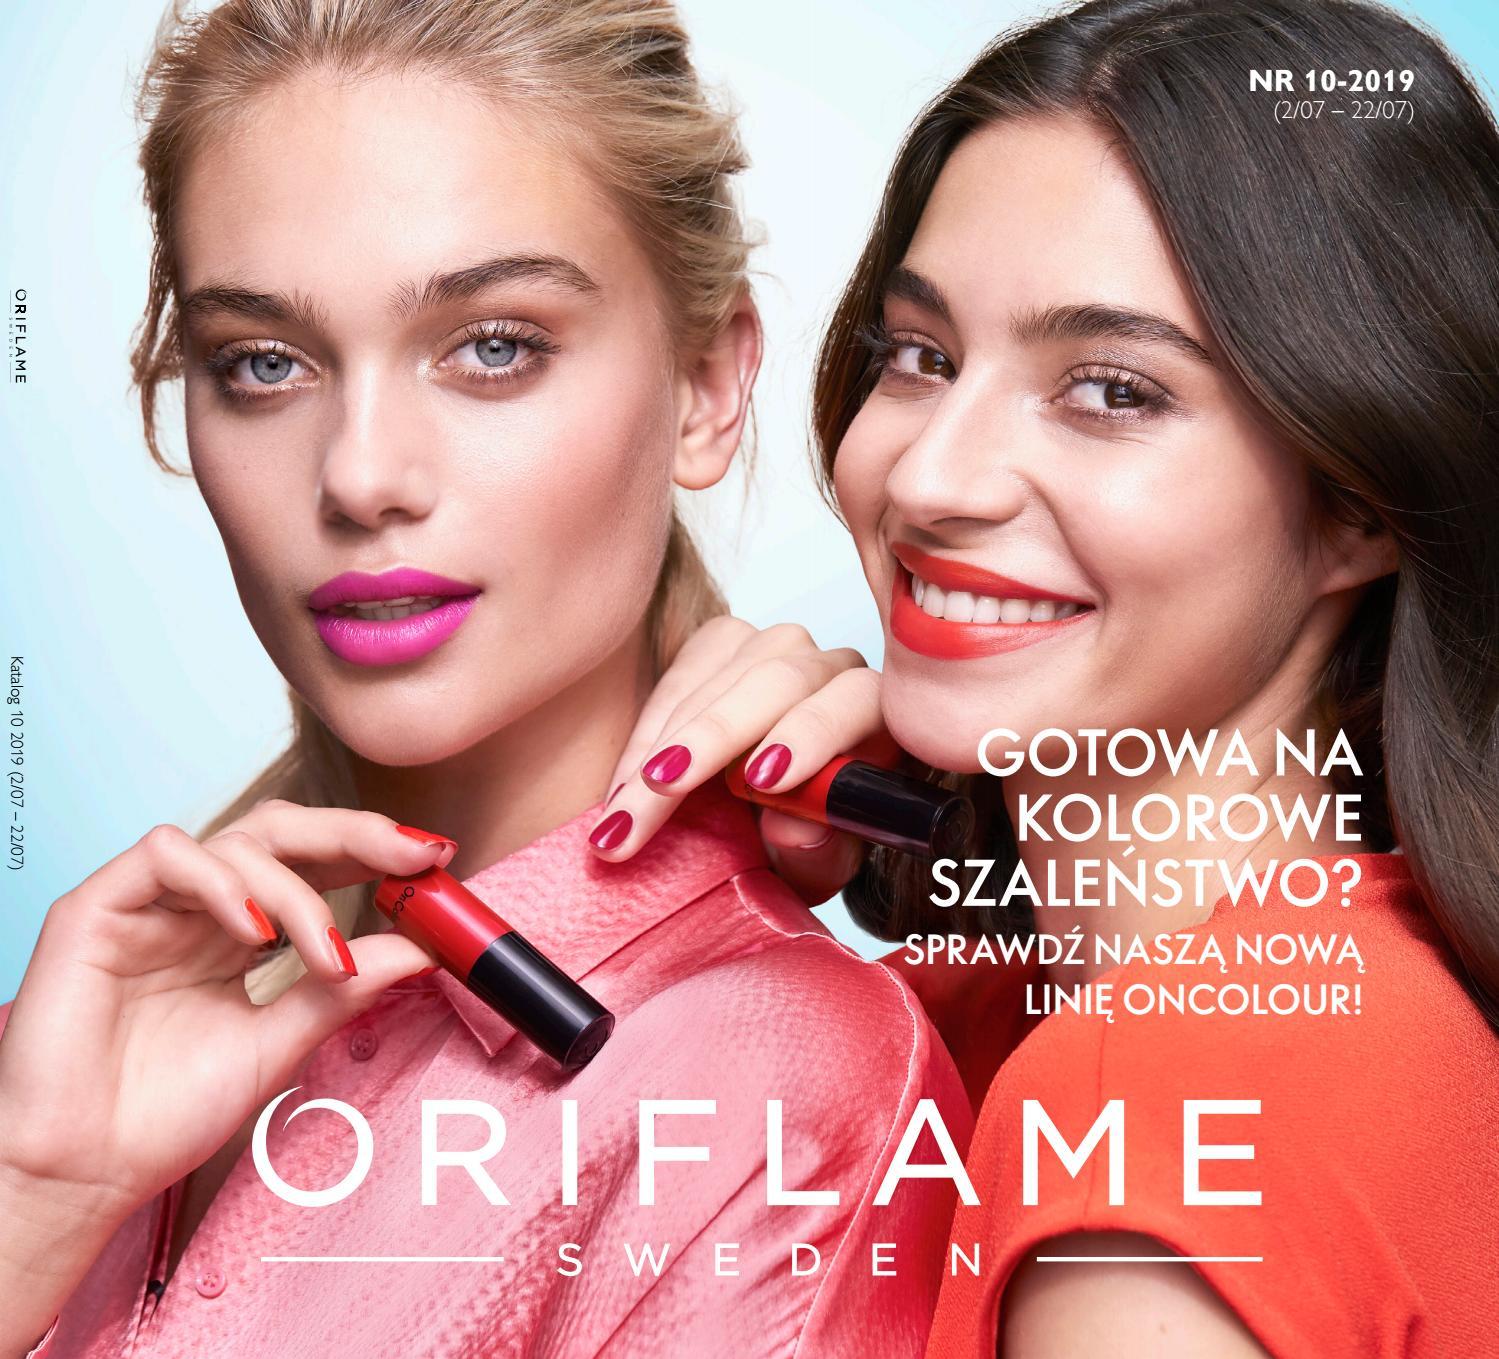 Katalog oriflame 10/2019 by Agnieszka Kowal - issuu